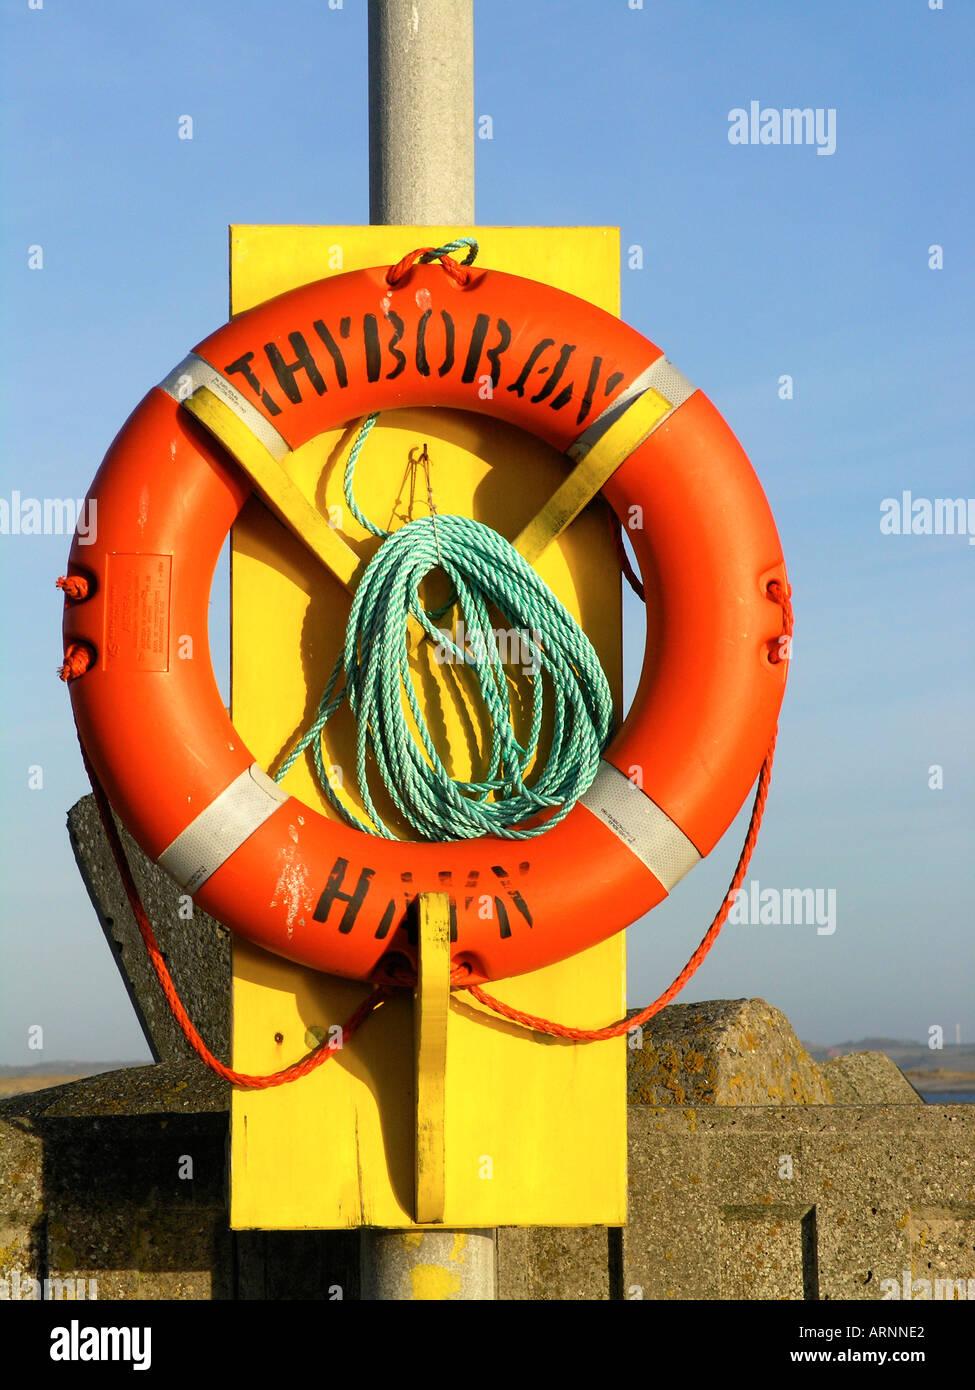 Rescue post - Stock Image